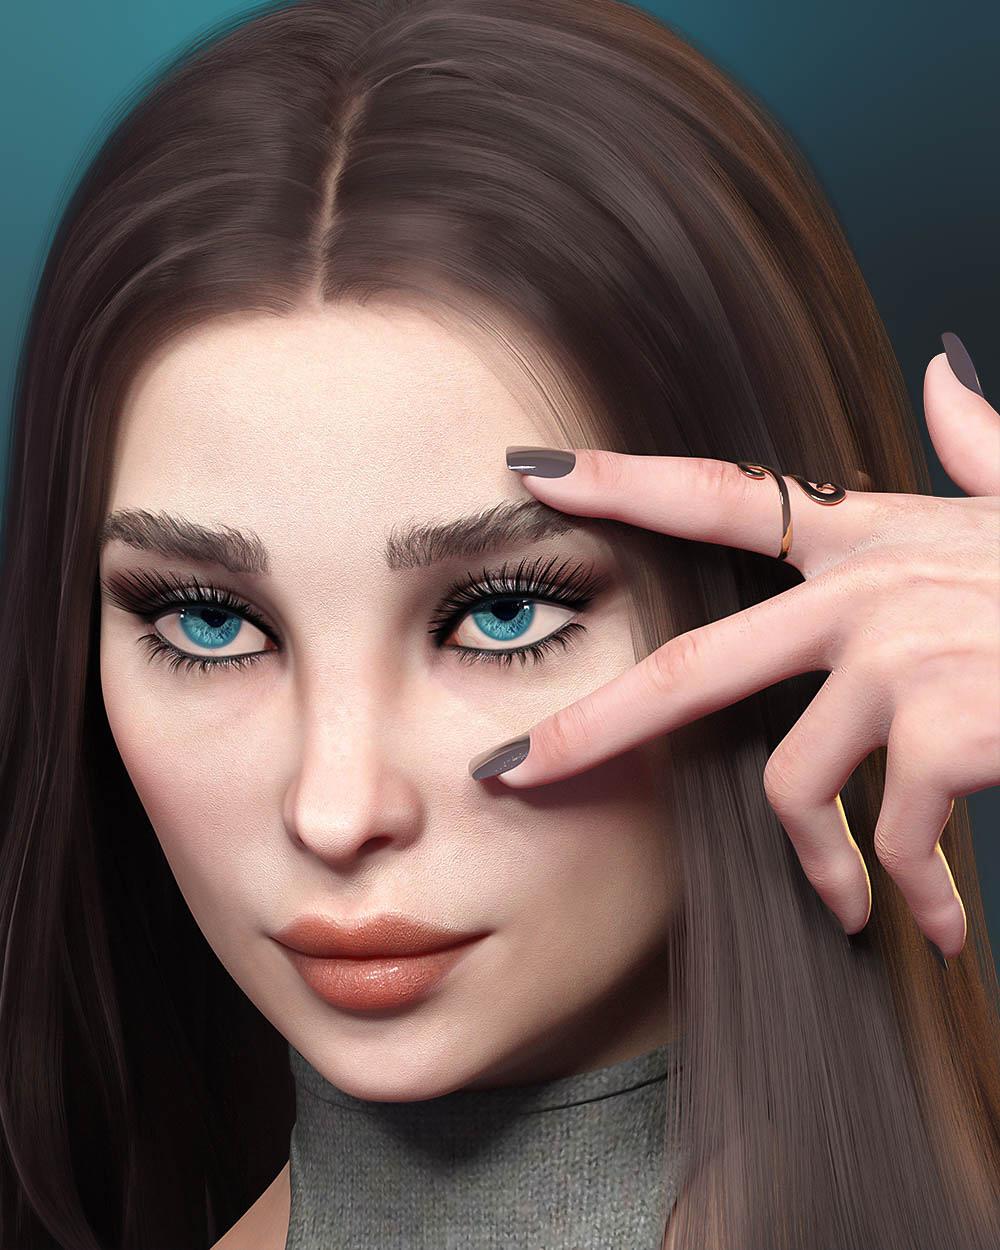 TM Everyday Lashes MR for Genesis 8.1 Female by: TwiztedMetal, 3D Models by Daz 3D